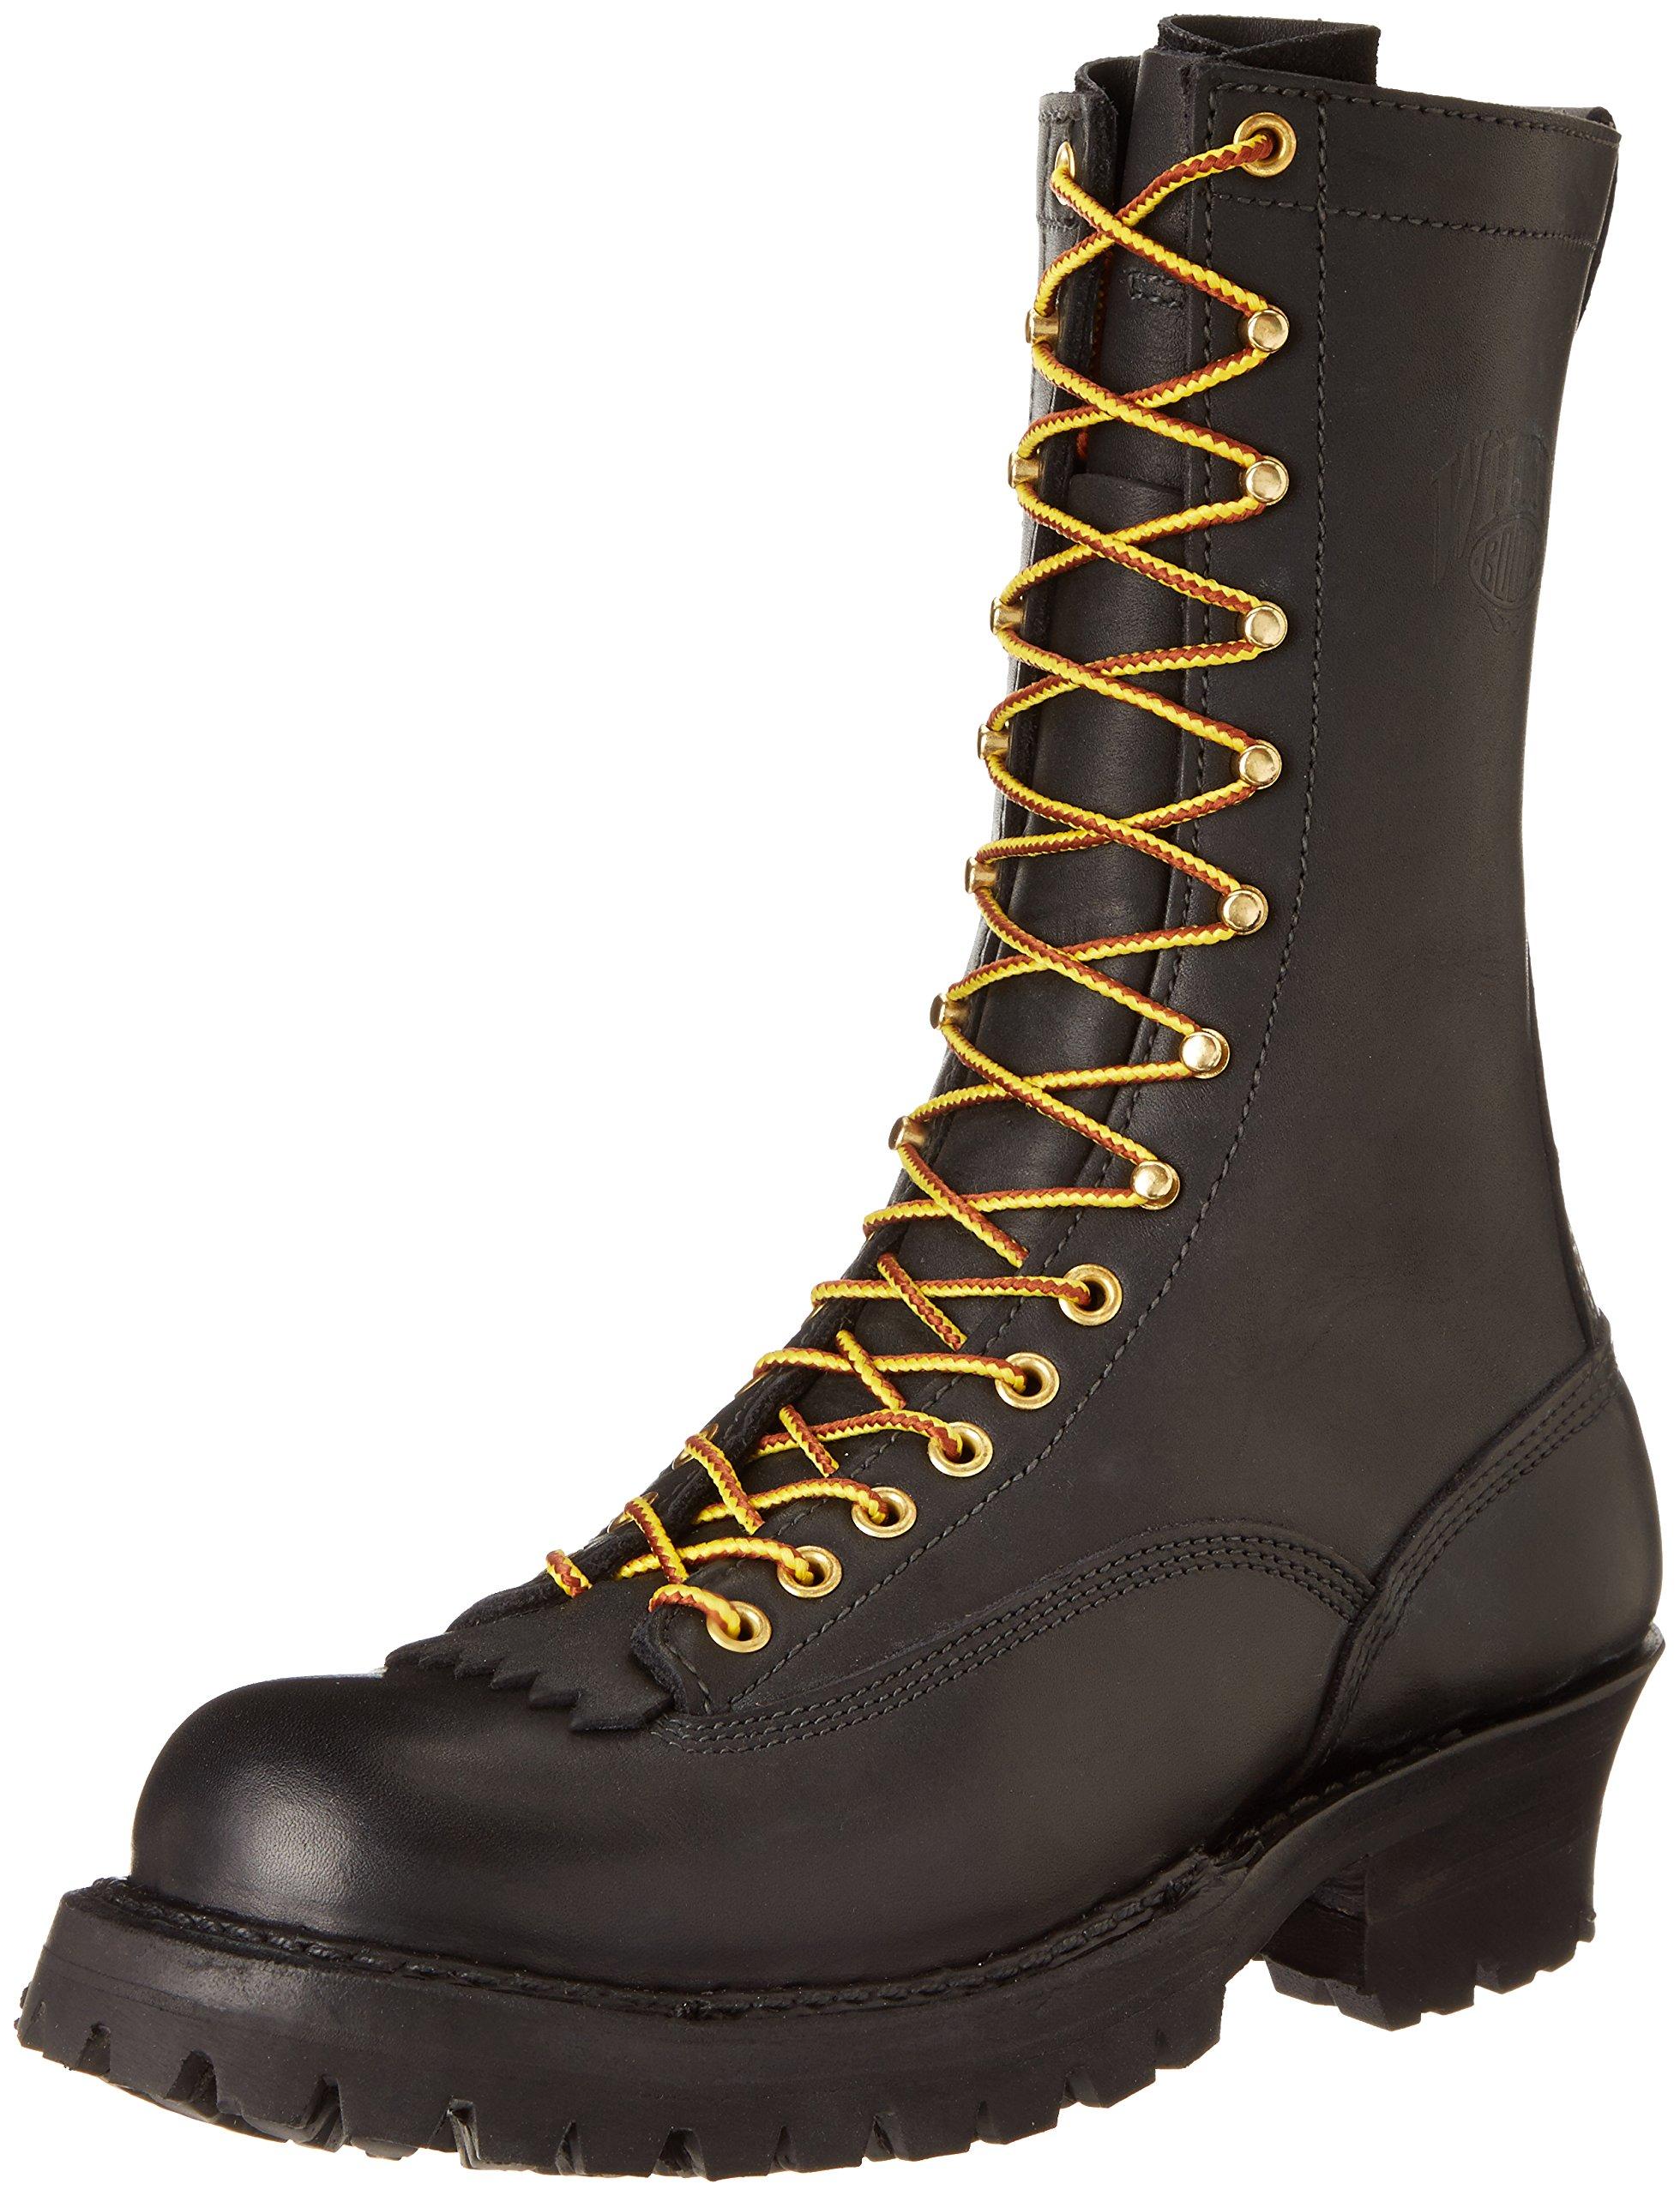 White's Boots Men's 400VLTT Smoke Jumper Lace-To-Toe Boot,Black,10 D US